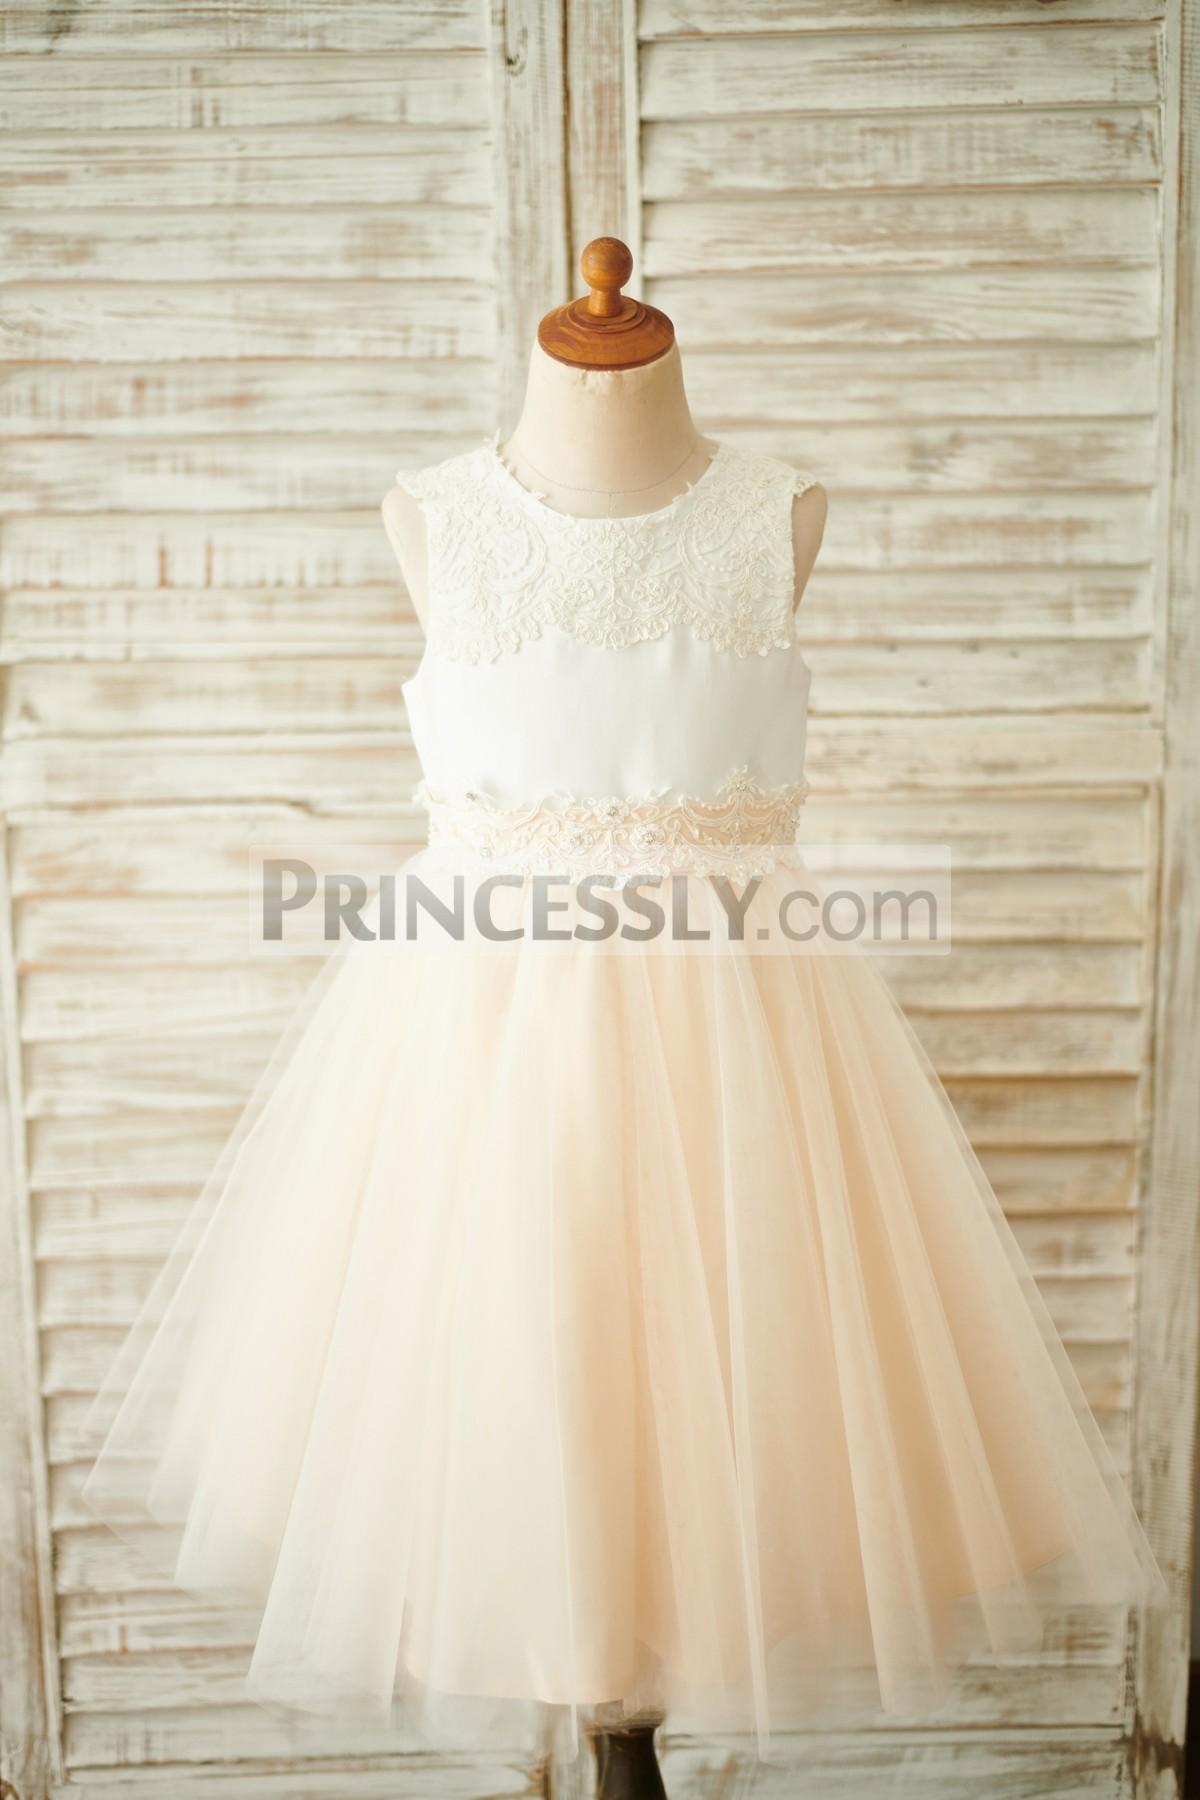 ed8385d400c Ivory Lace Satin Champagne Tulle Sheer Back Wedding Flower Girl ...